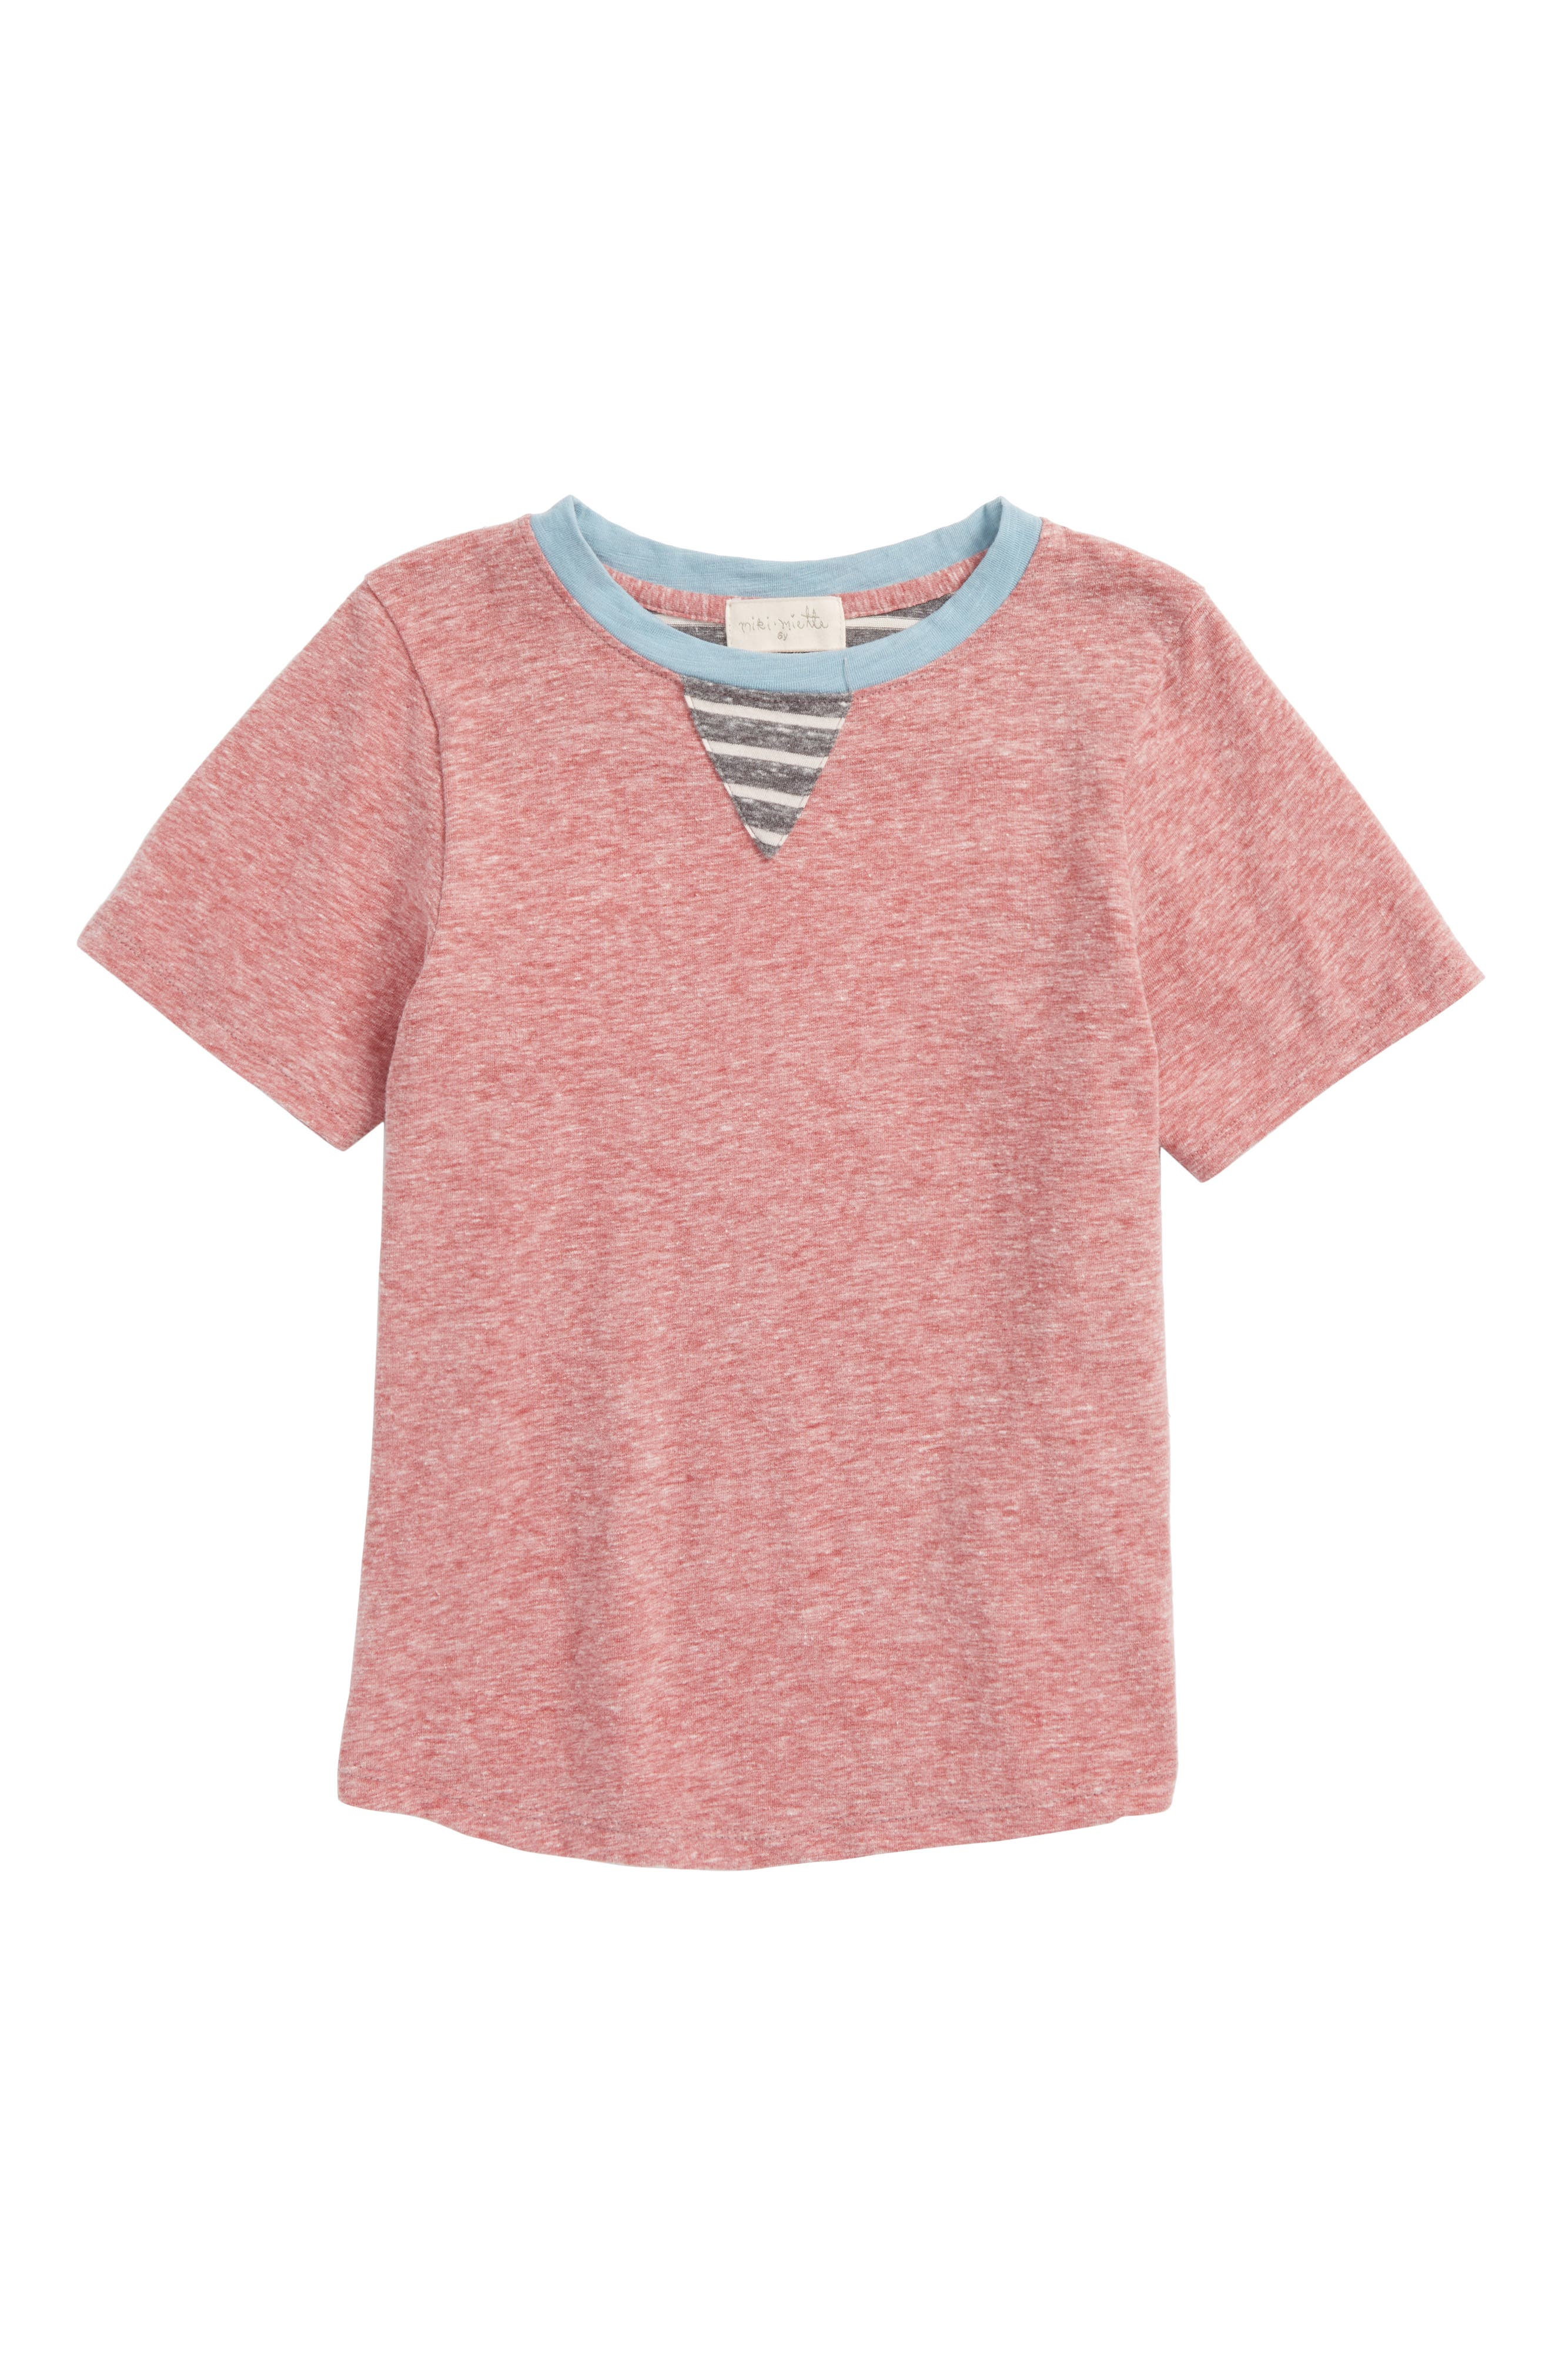 Miki Miette Ryker T-Shirt (Toddler Boys, Little Boys & Big Boys)